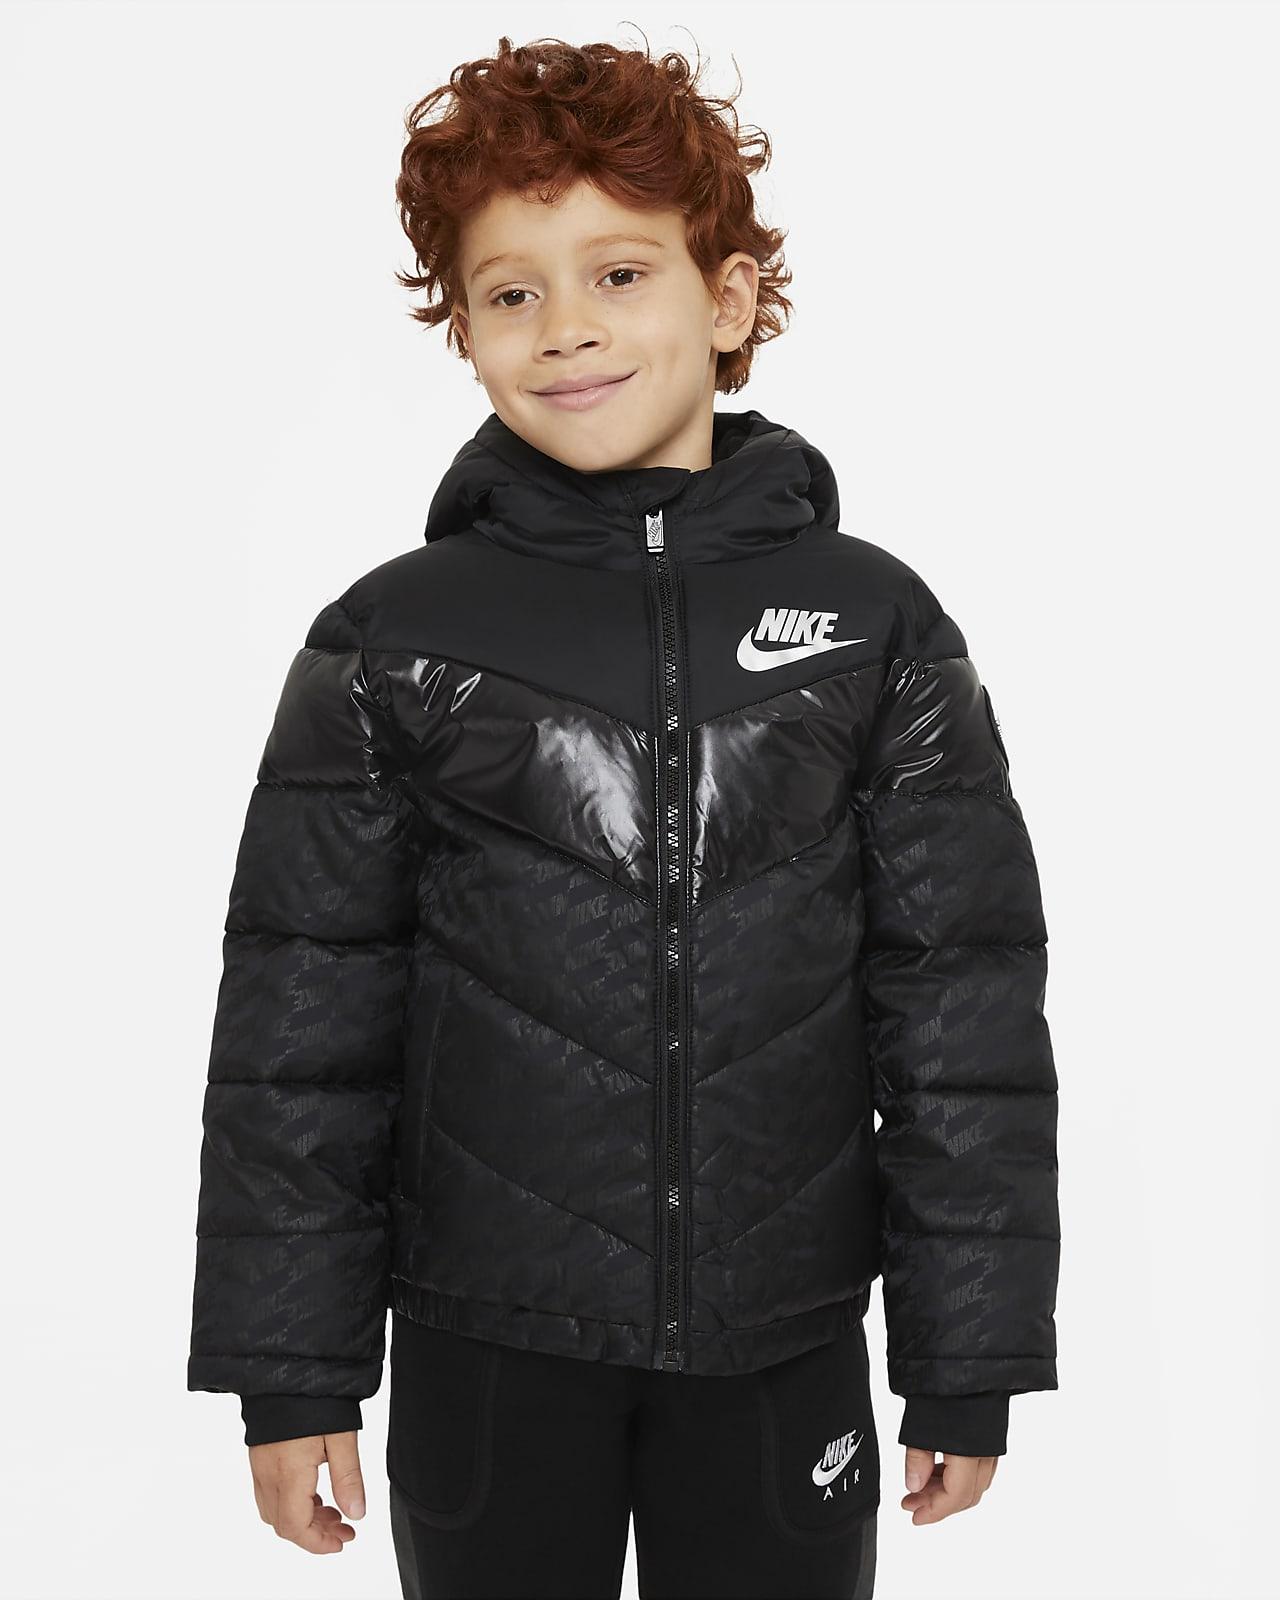 Nike Little Kids' Color-Block Puffer Jacket